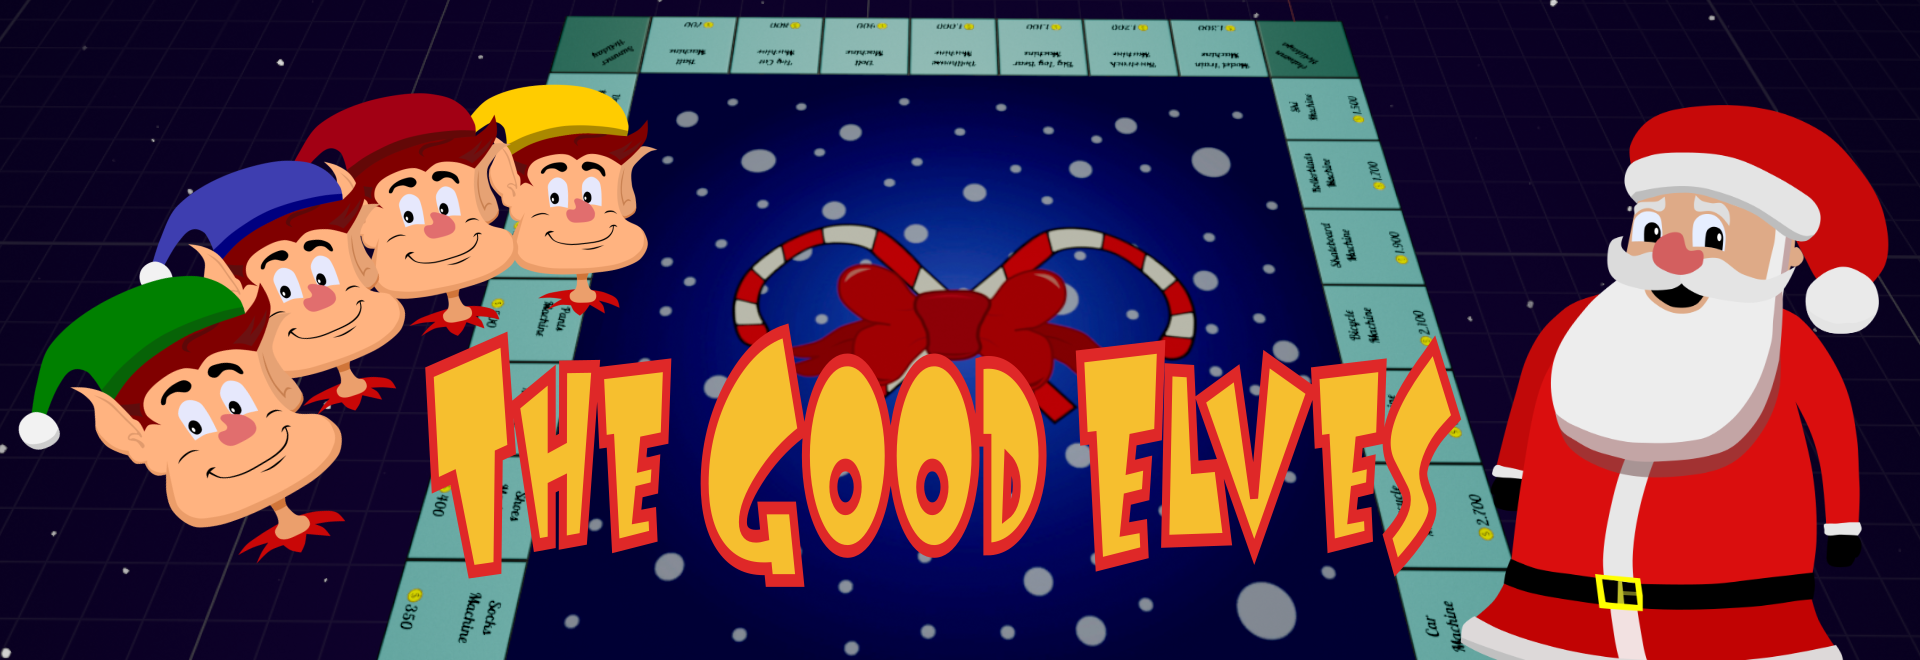 The Good Elves